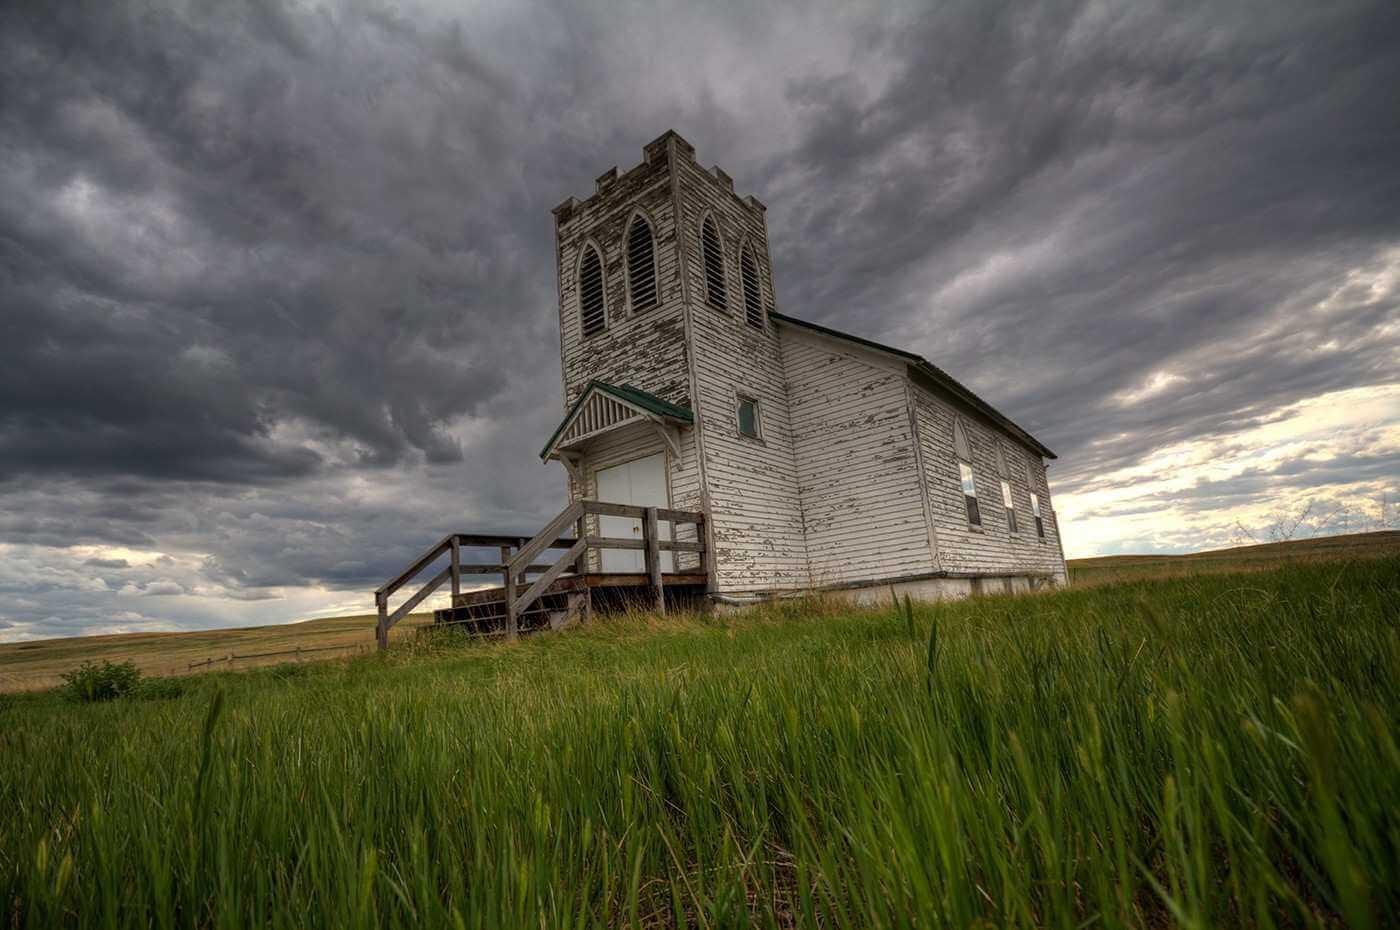 Trotters, North Dakota